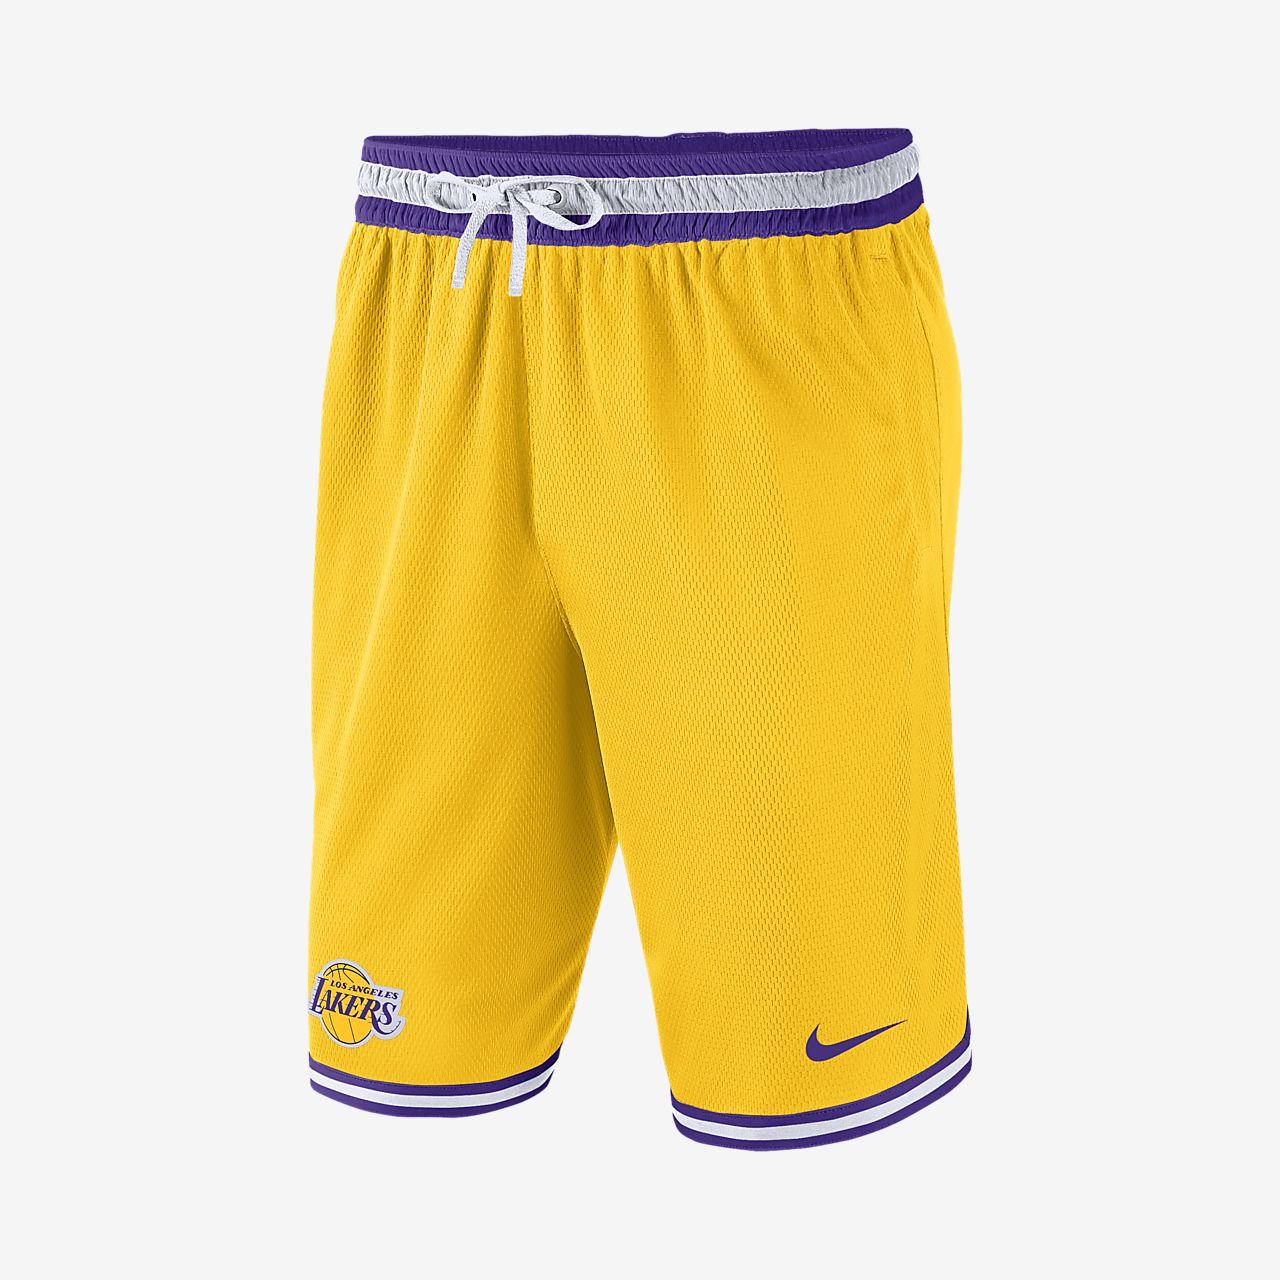 Short NBA Los Angeles Lakers Nike pour Homme